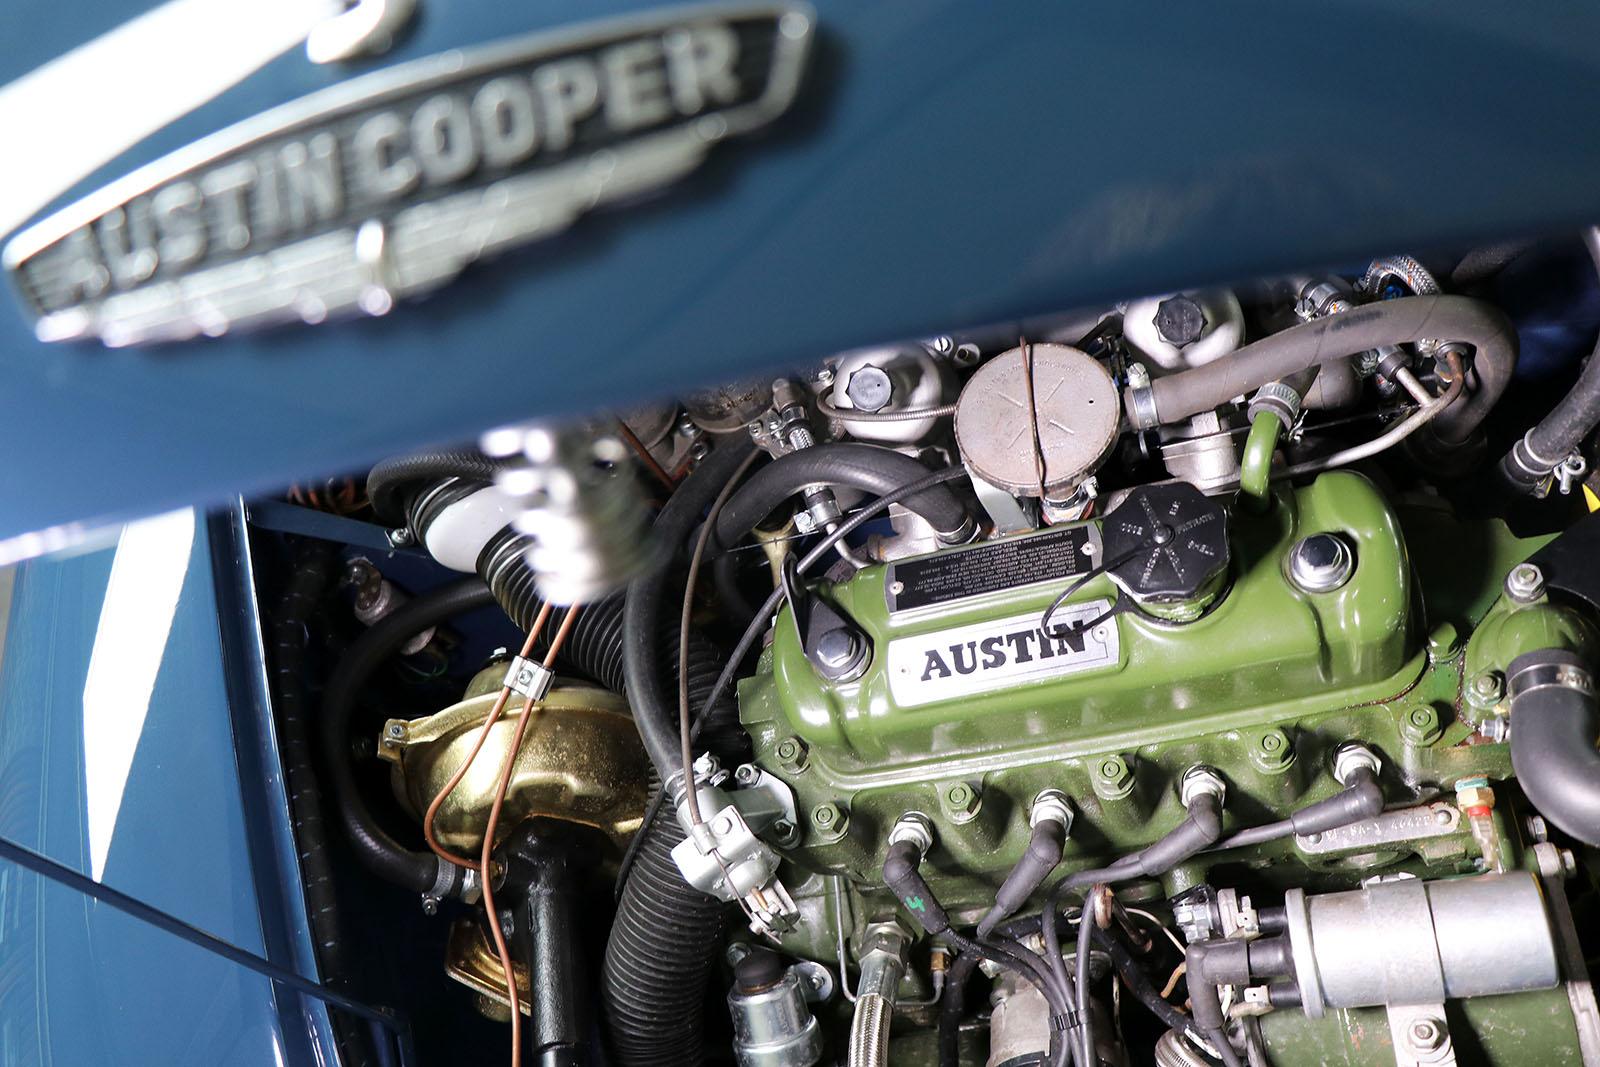 1967 blue Mini Cooper S engine web.jpg